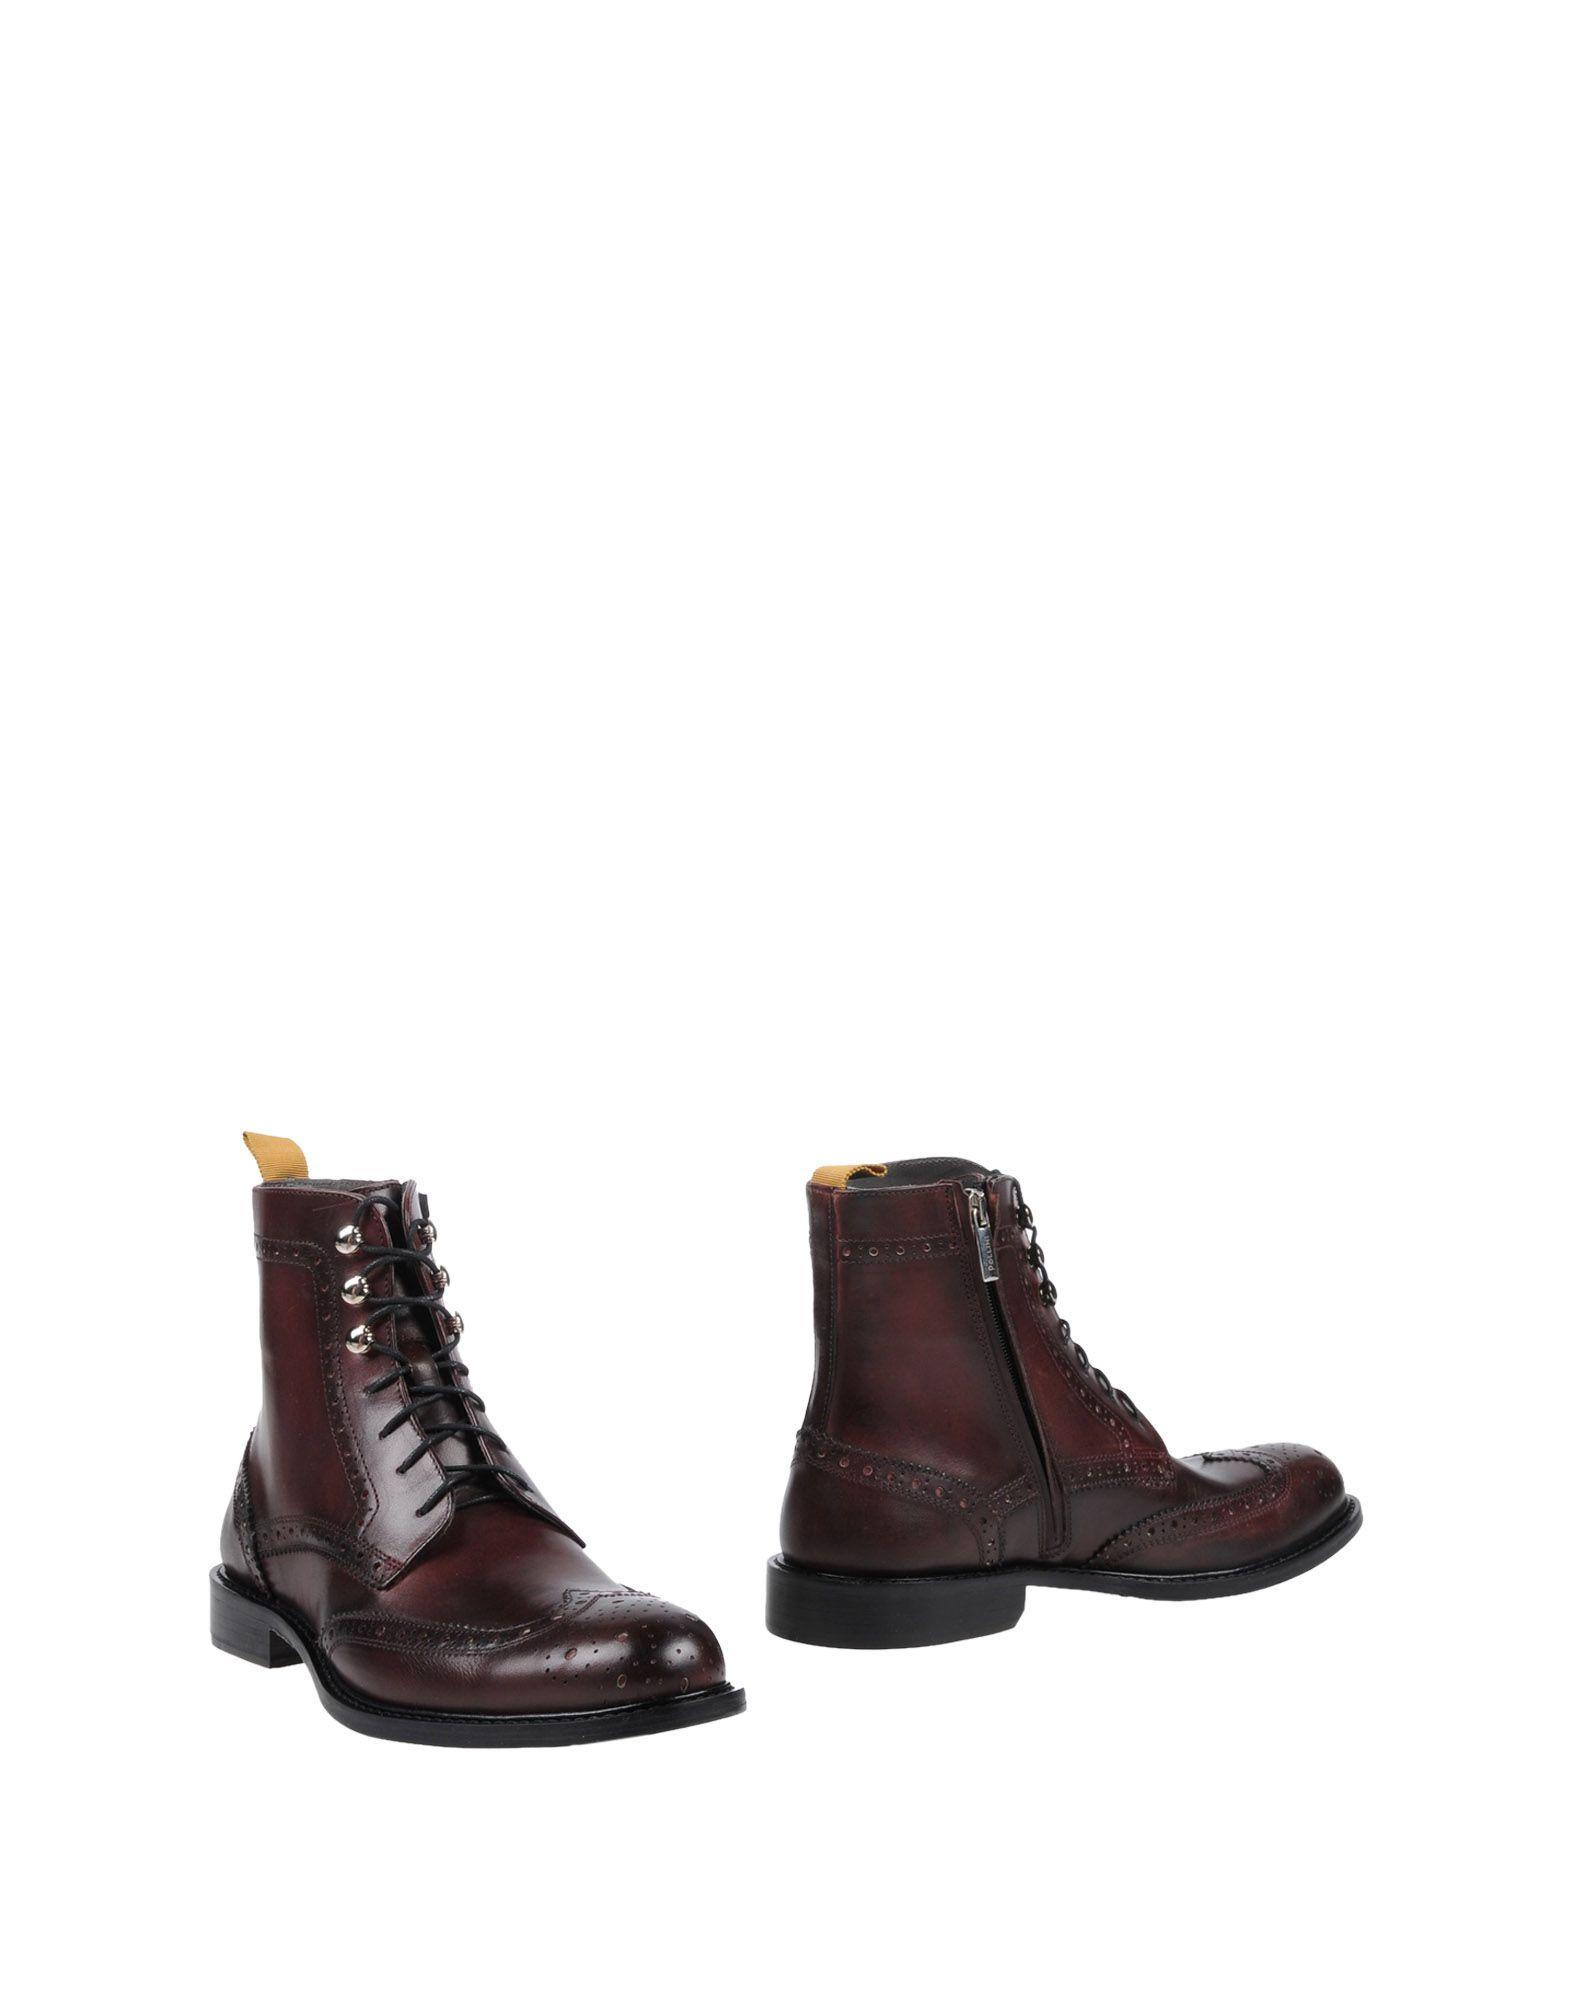 Pollini Boots In Maroon